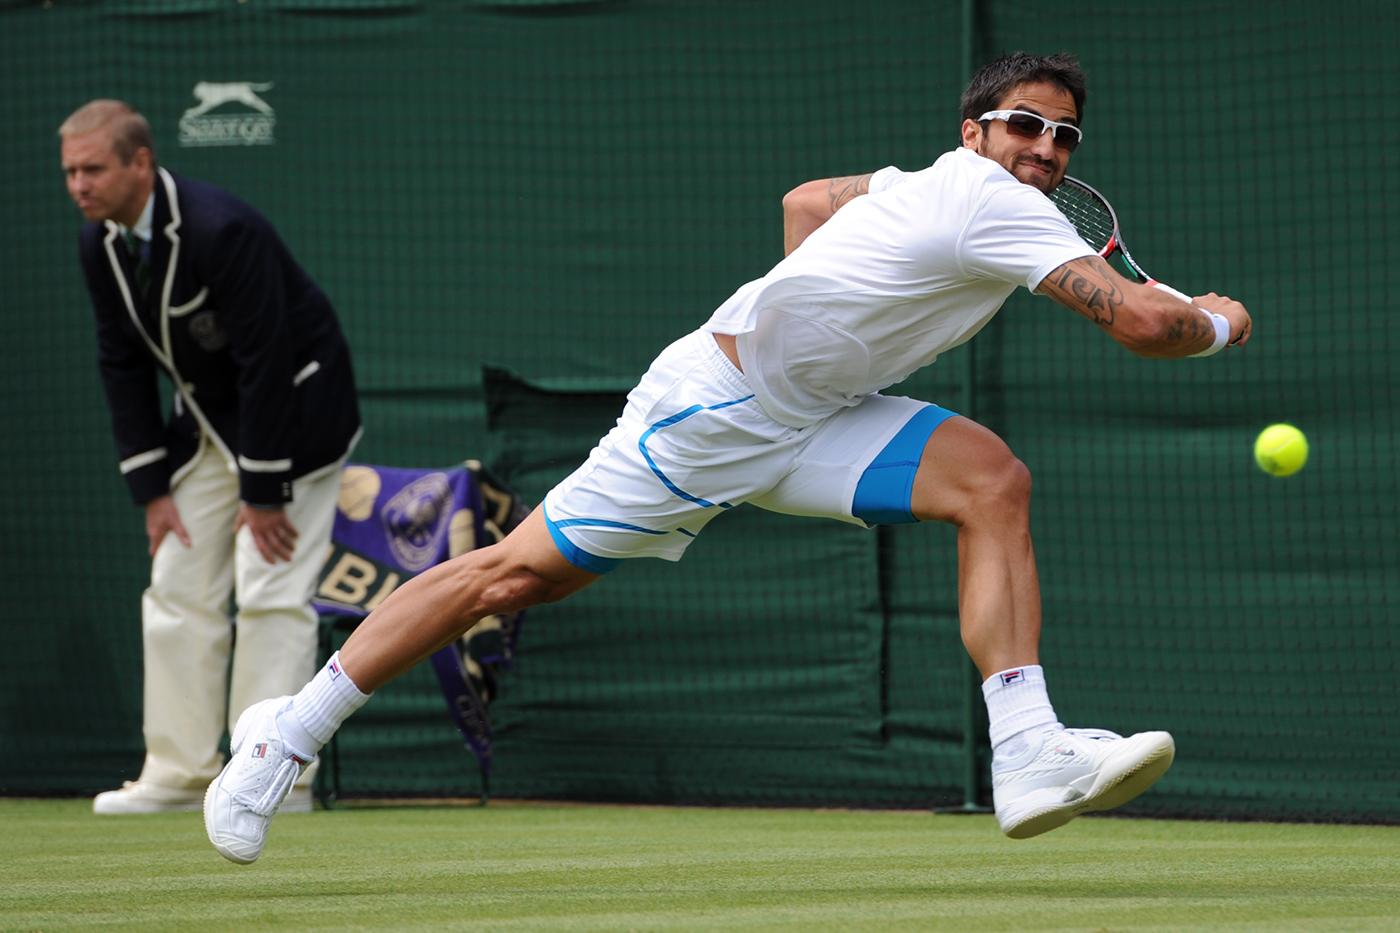 oakley radar tennis